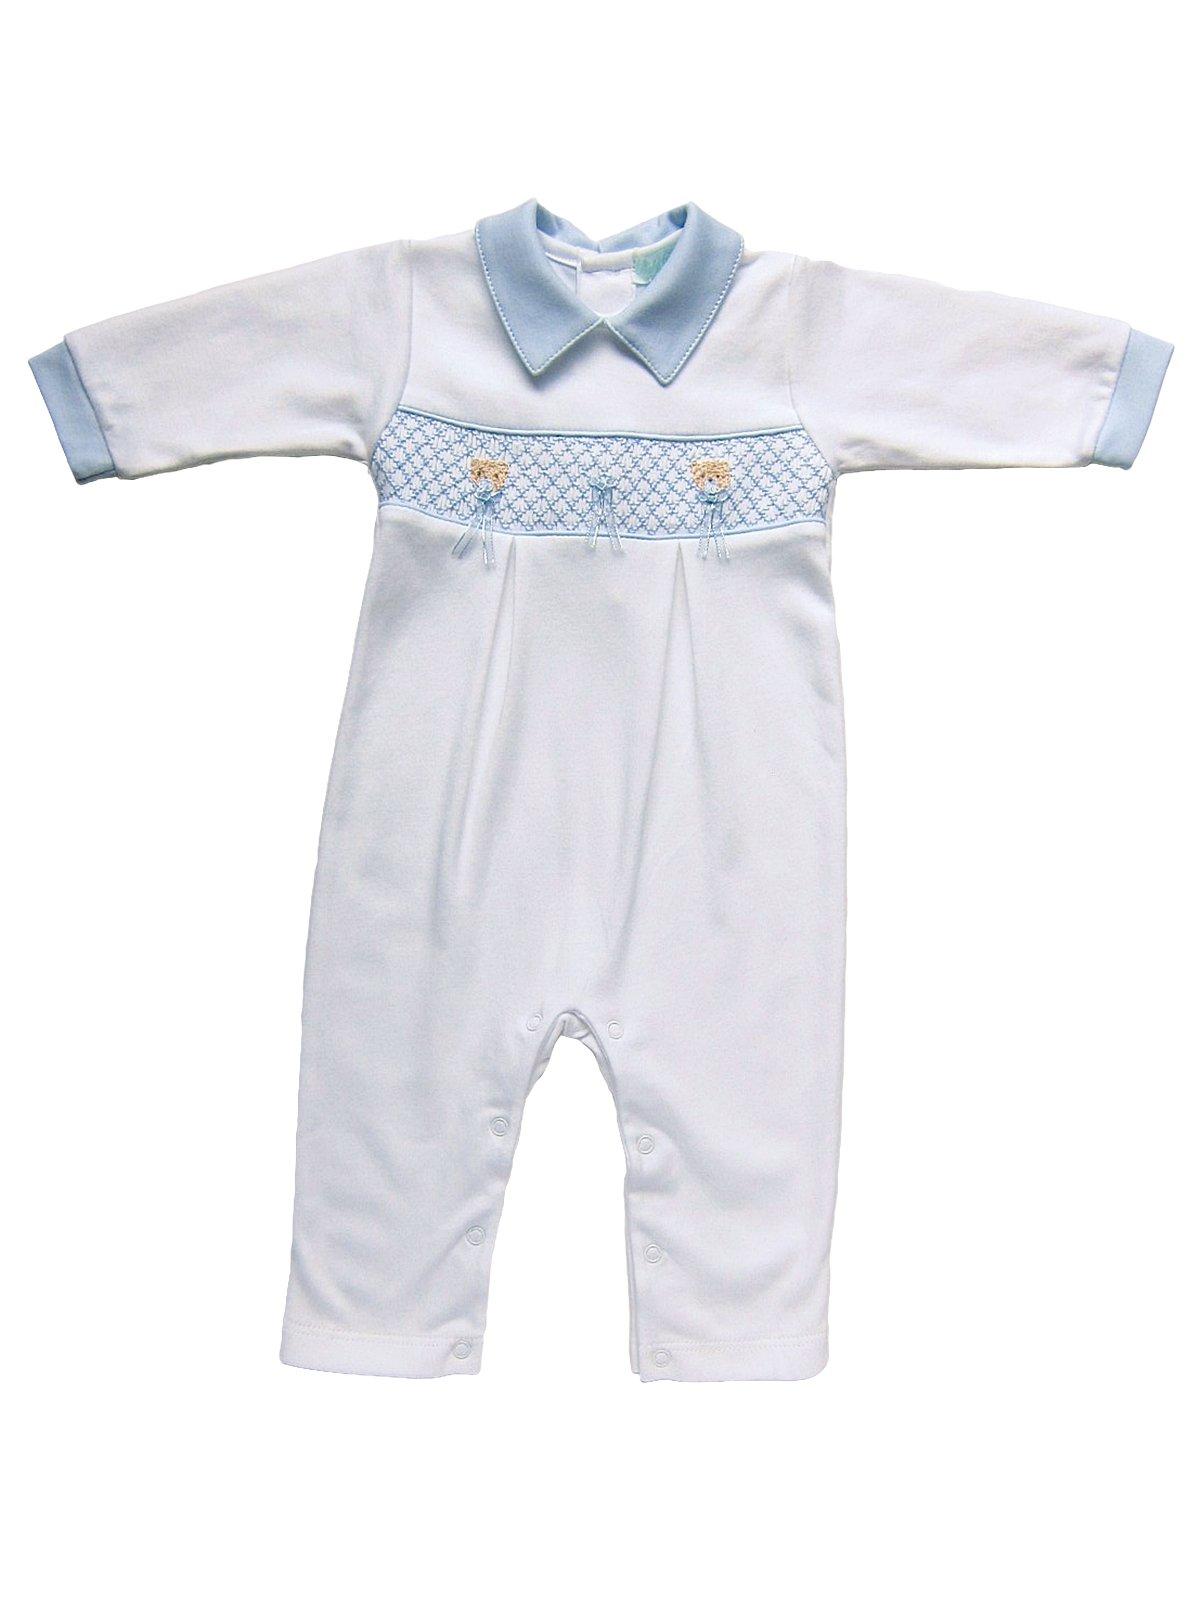 Baby_Footsie_Blue_2496.jpg